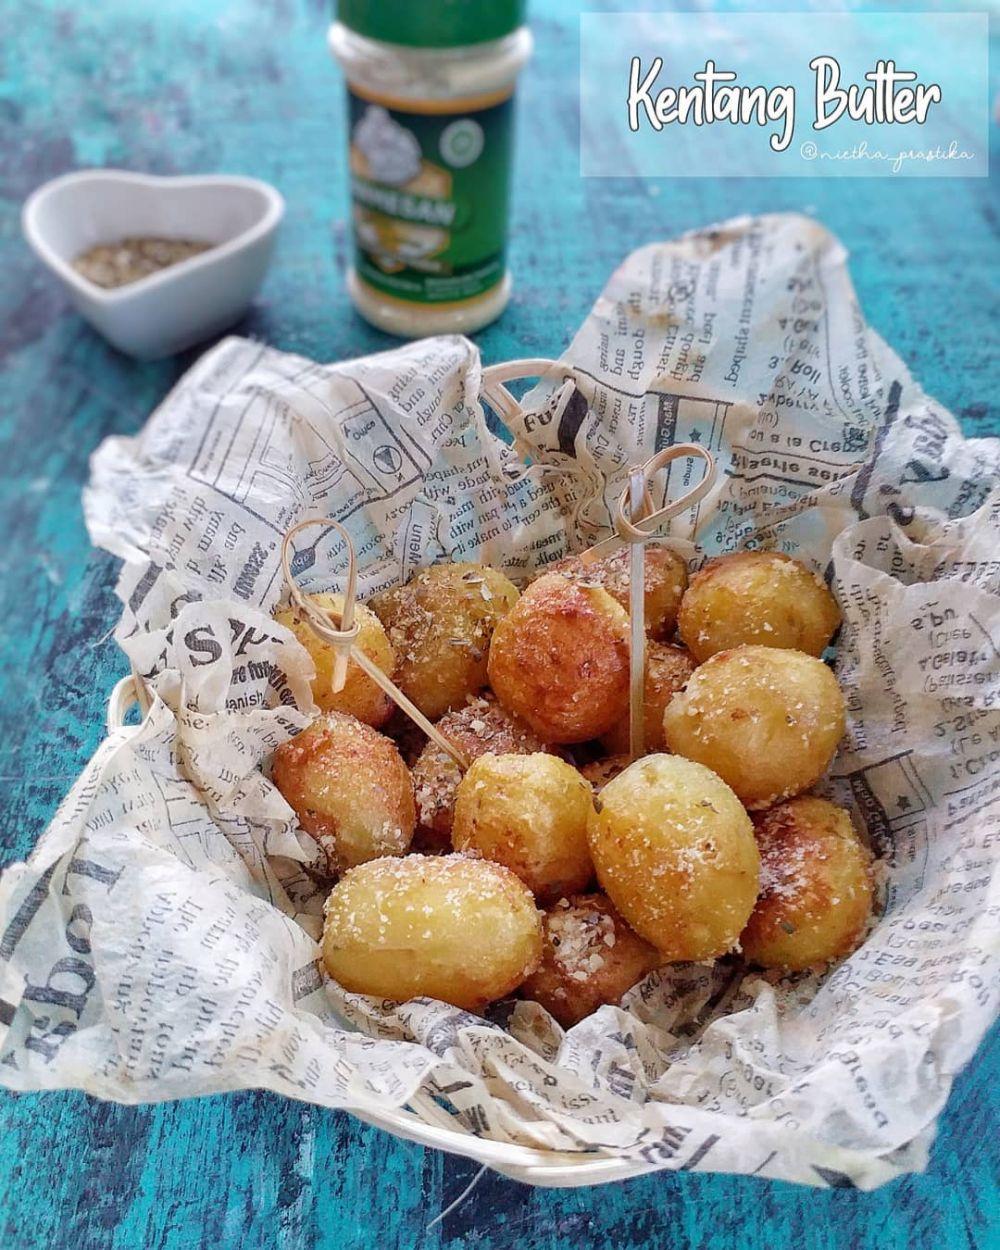 Olahan kentang paling sederhana Instagram